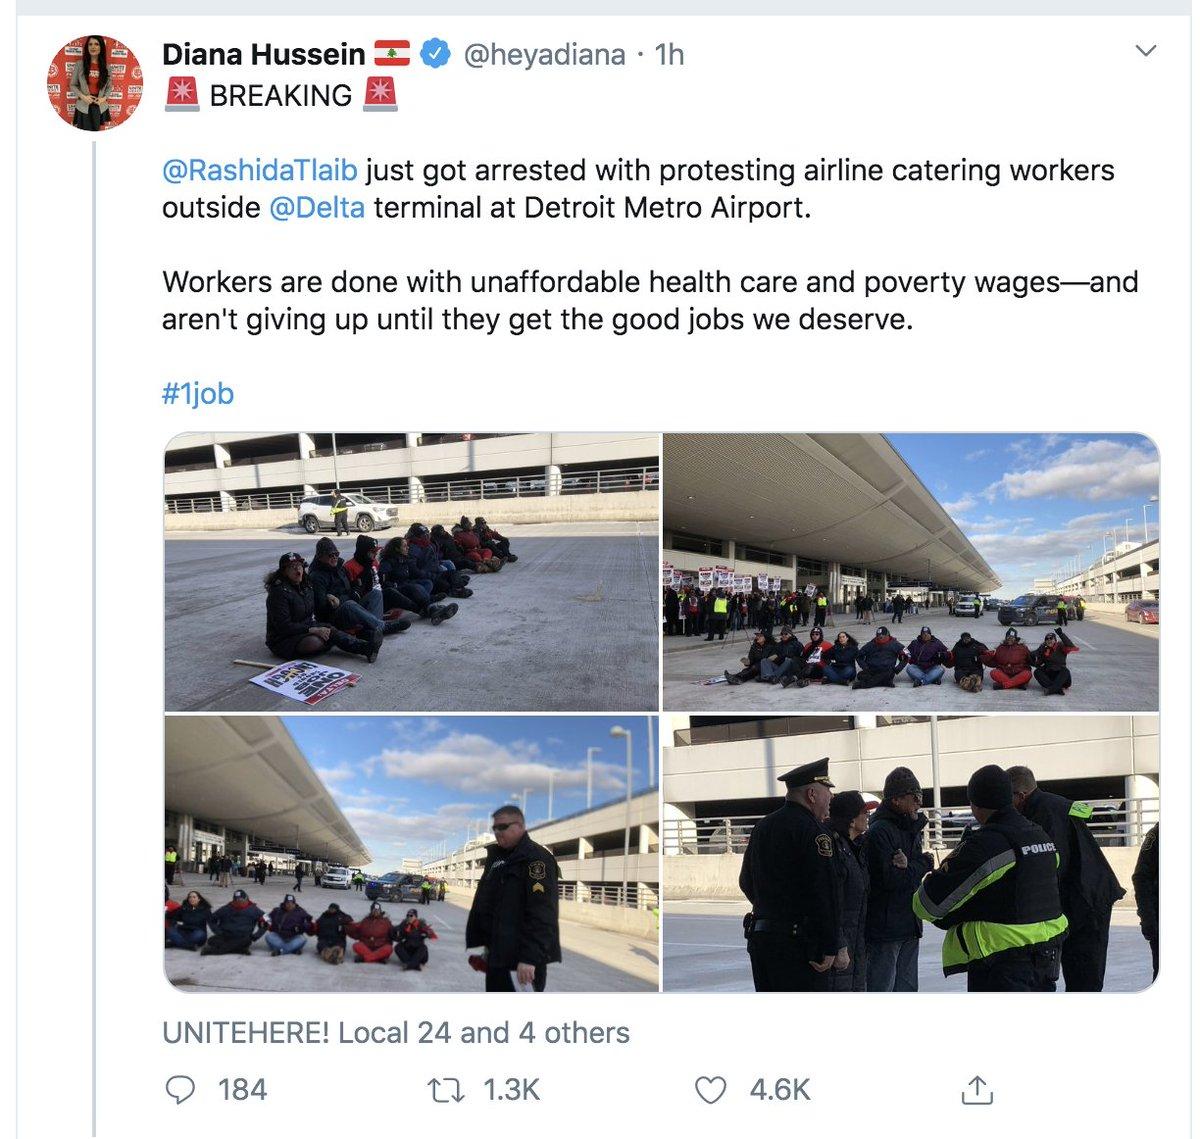 Oops. 4,600 likes later, @RashidaTlaib was NOT arrested... twitter.com/heyadiana/stat…